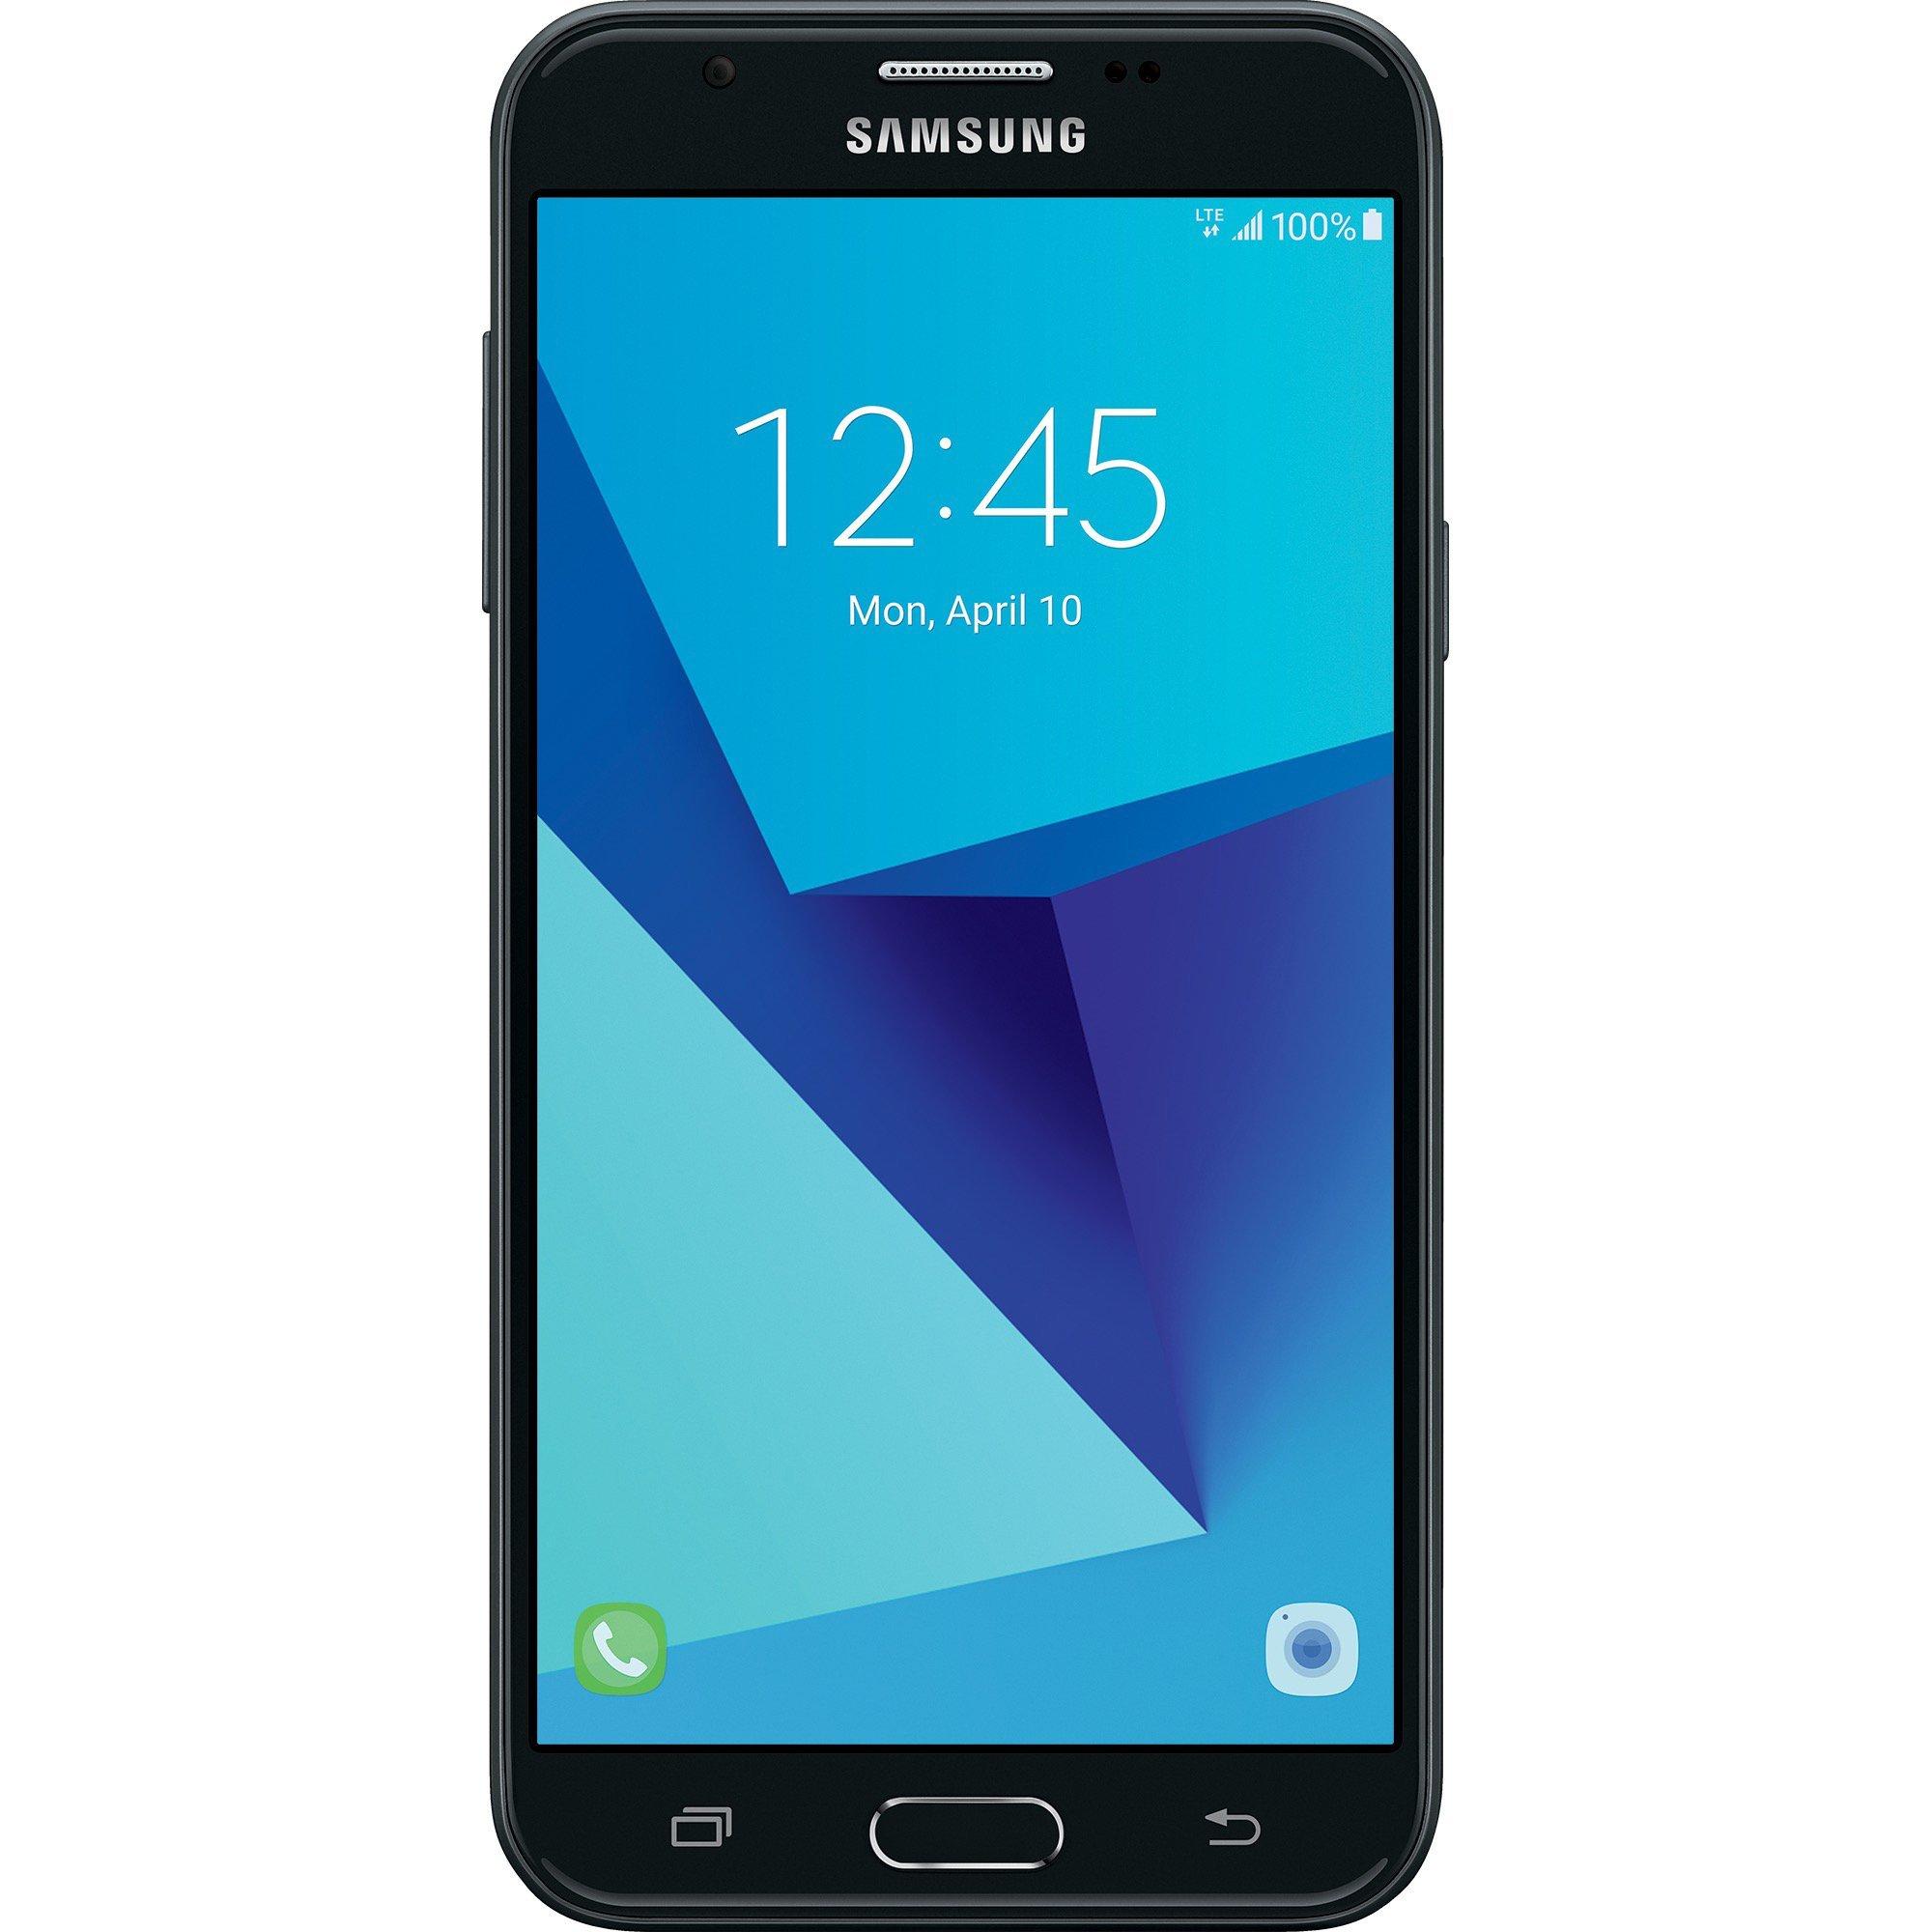 TracFone Samsung Galaxy J7 Sky Pro 4G LTE Prepaid Smartphone by TracFone